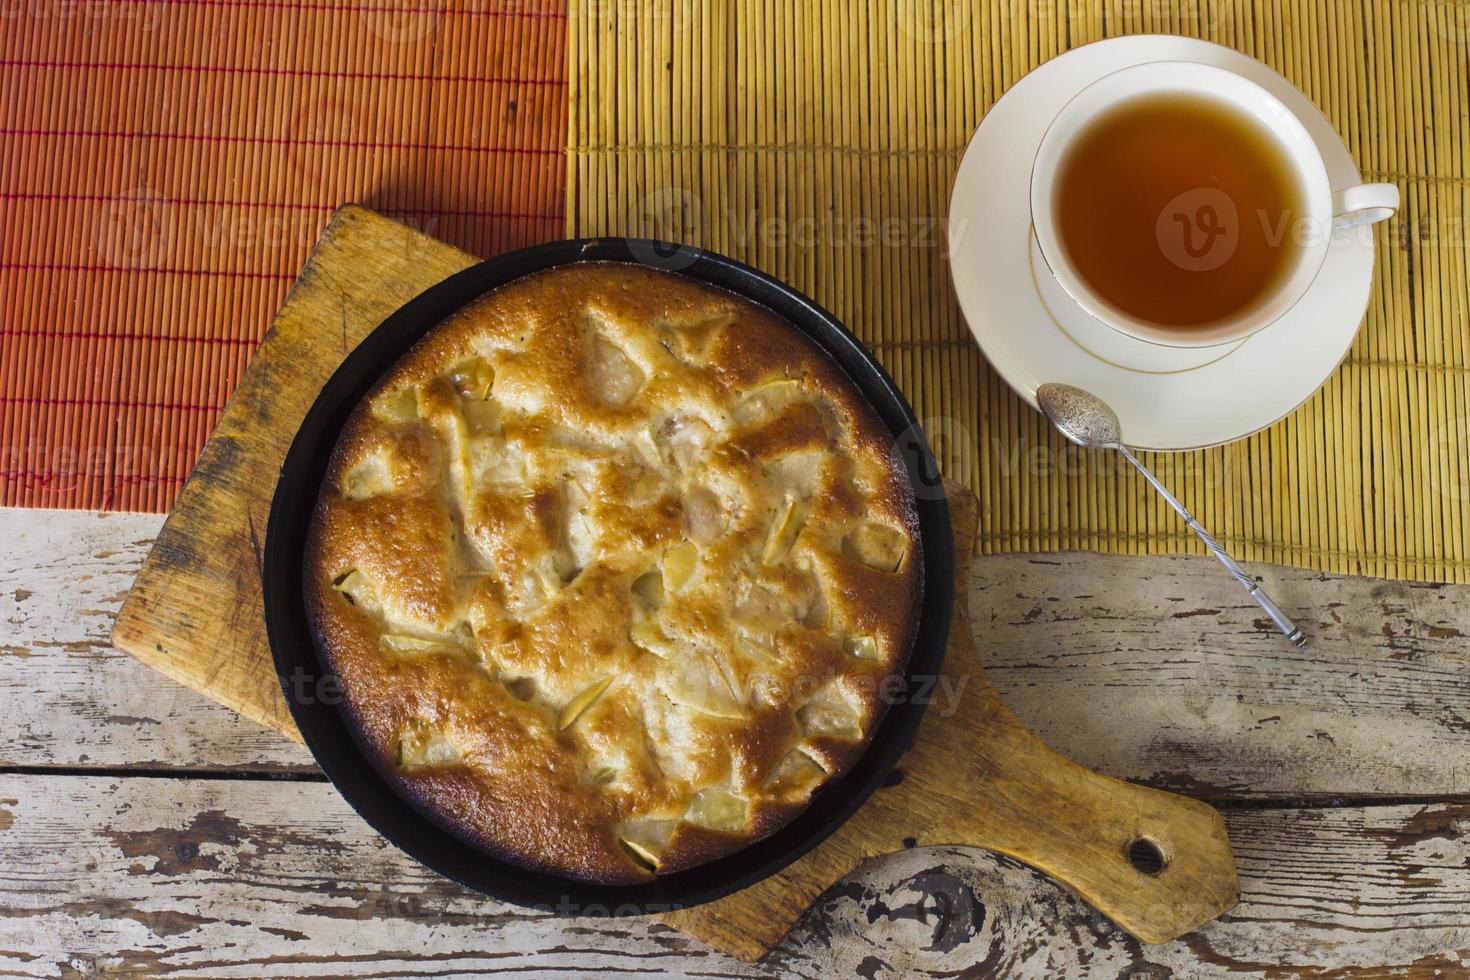 Charlotte. torta de maçã com chá foto